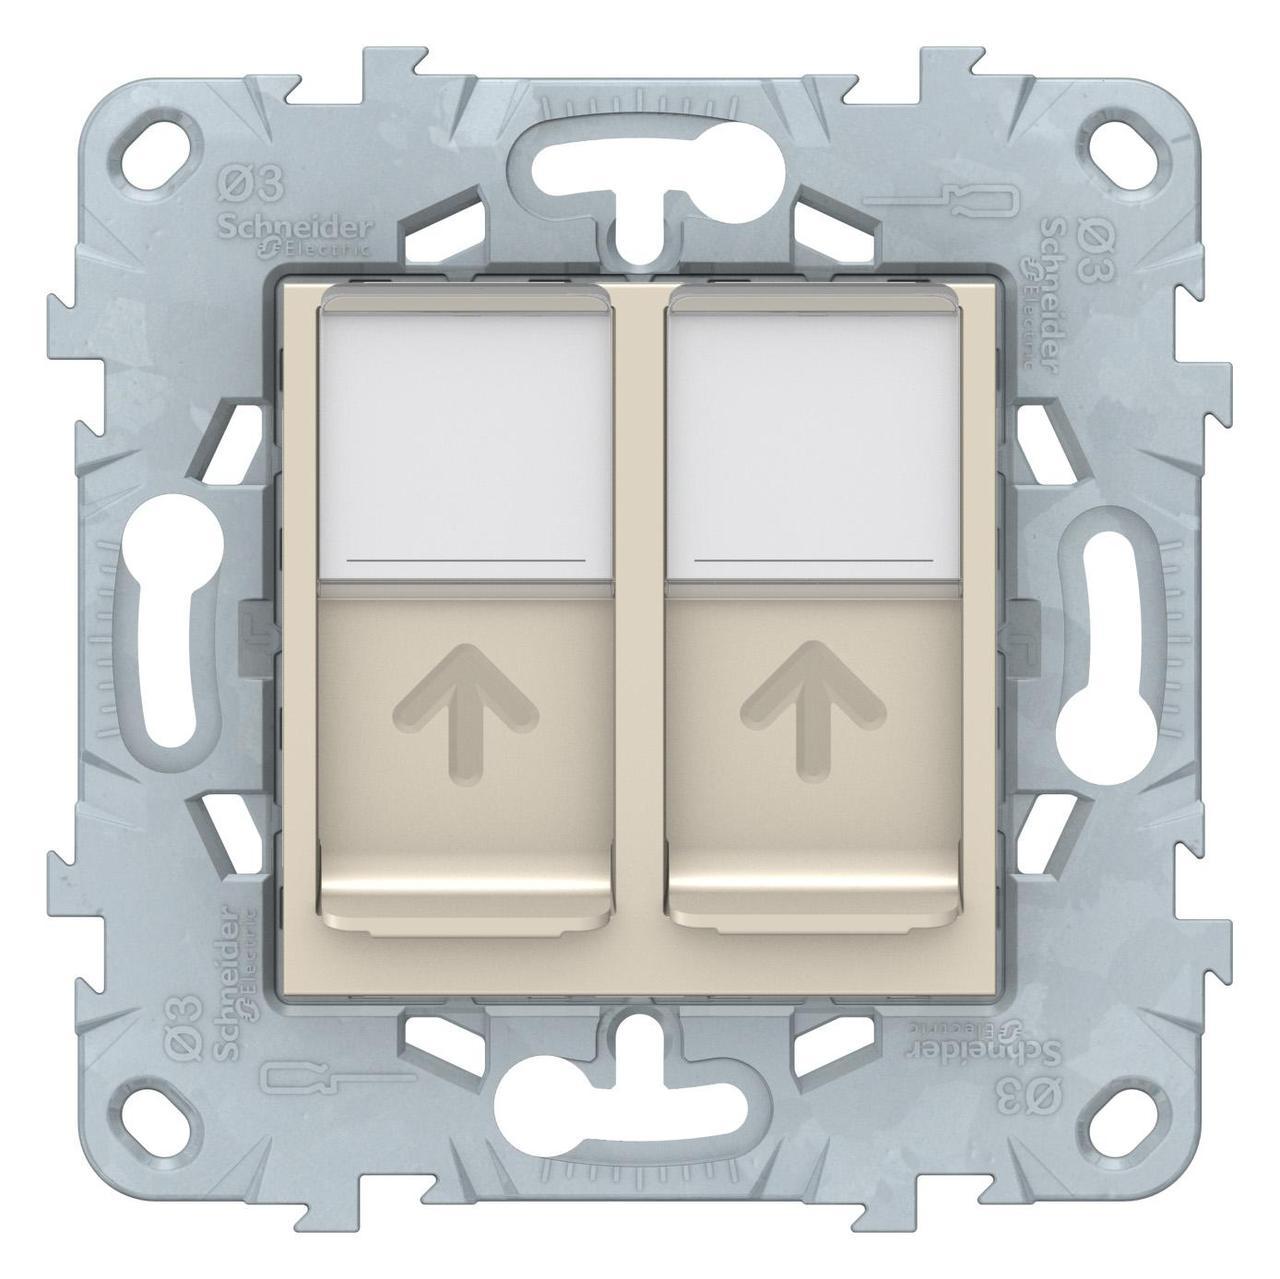 Розетка компьютерная 2-ая кат.5е, RJ-45 (интернет) , Бежевый, серия Unica New, Schneider Electric